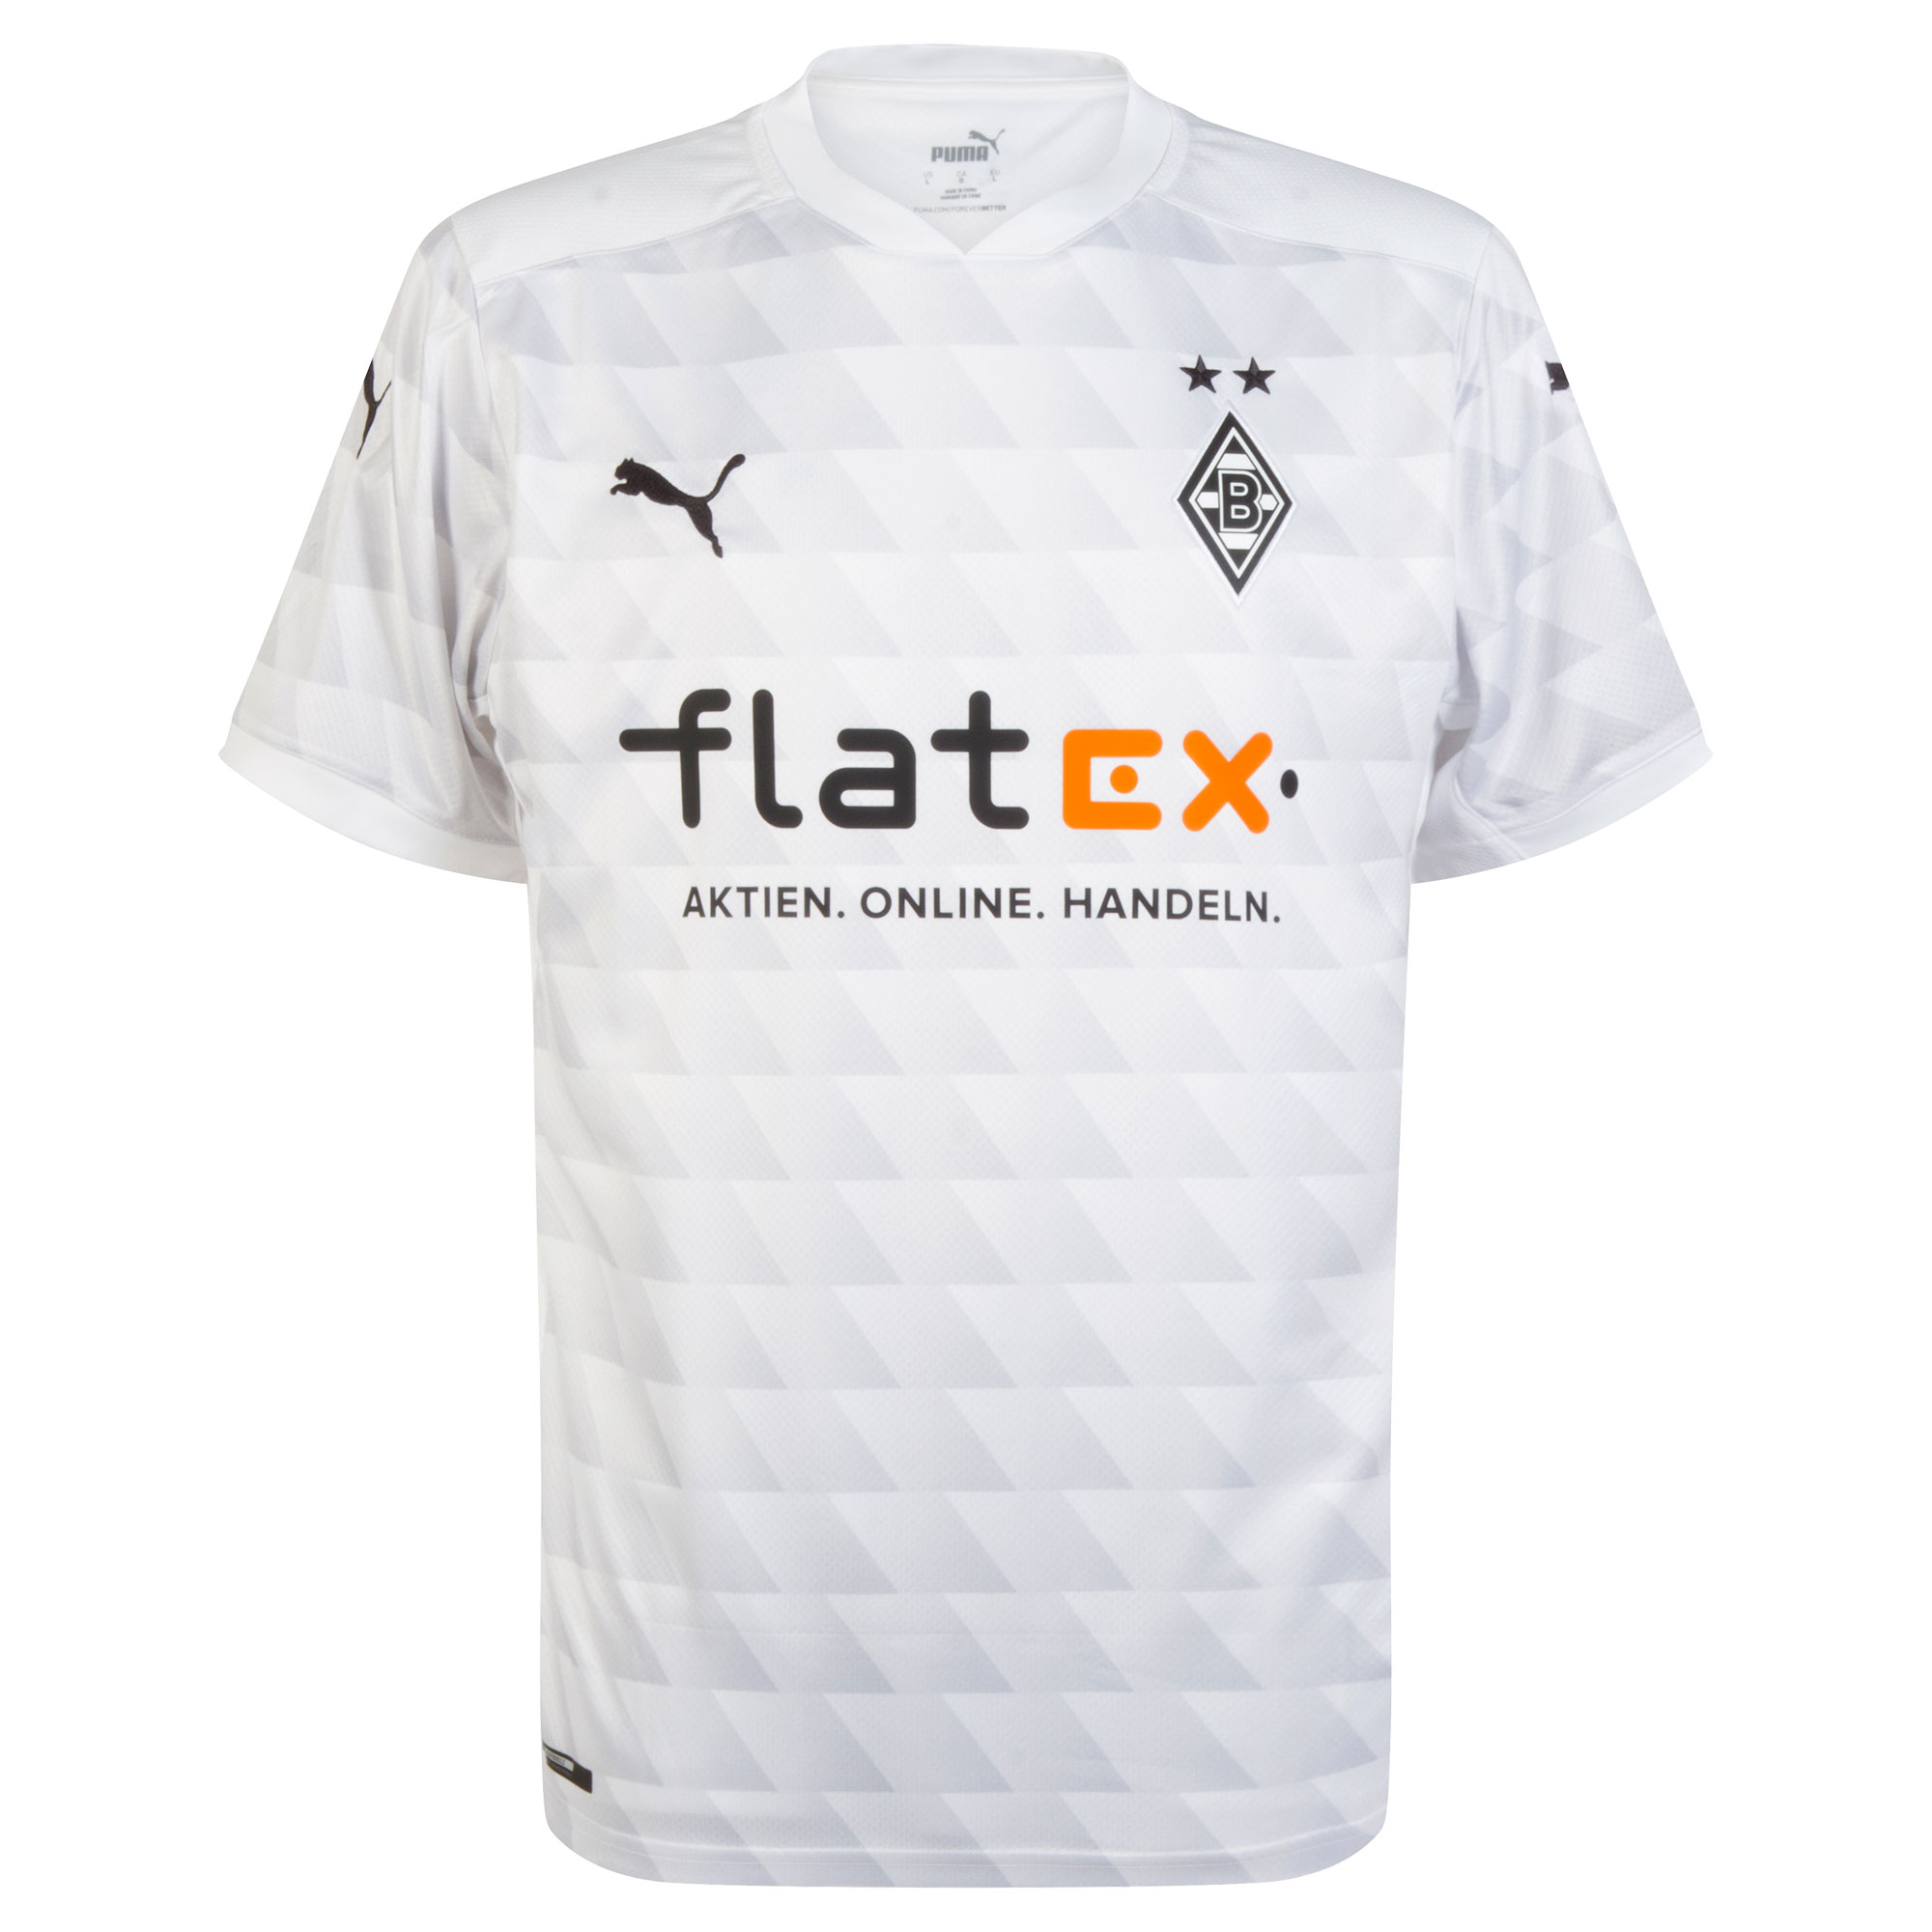 Puma Borussia Monchengladbach Home Shirt 2020-2021